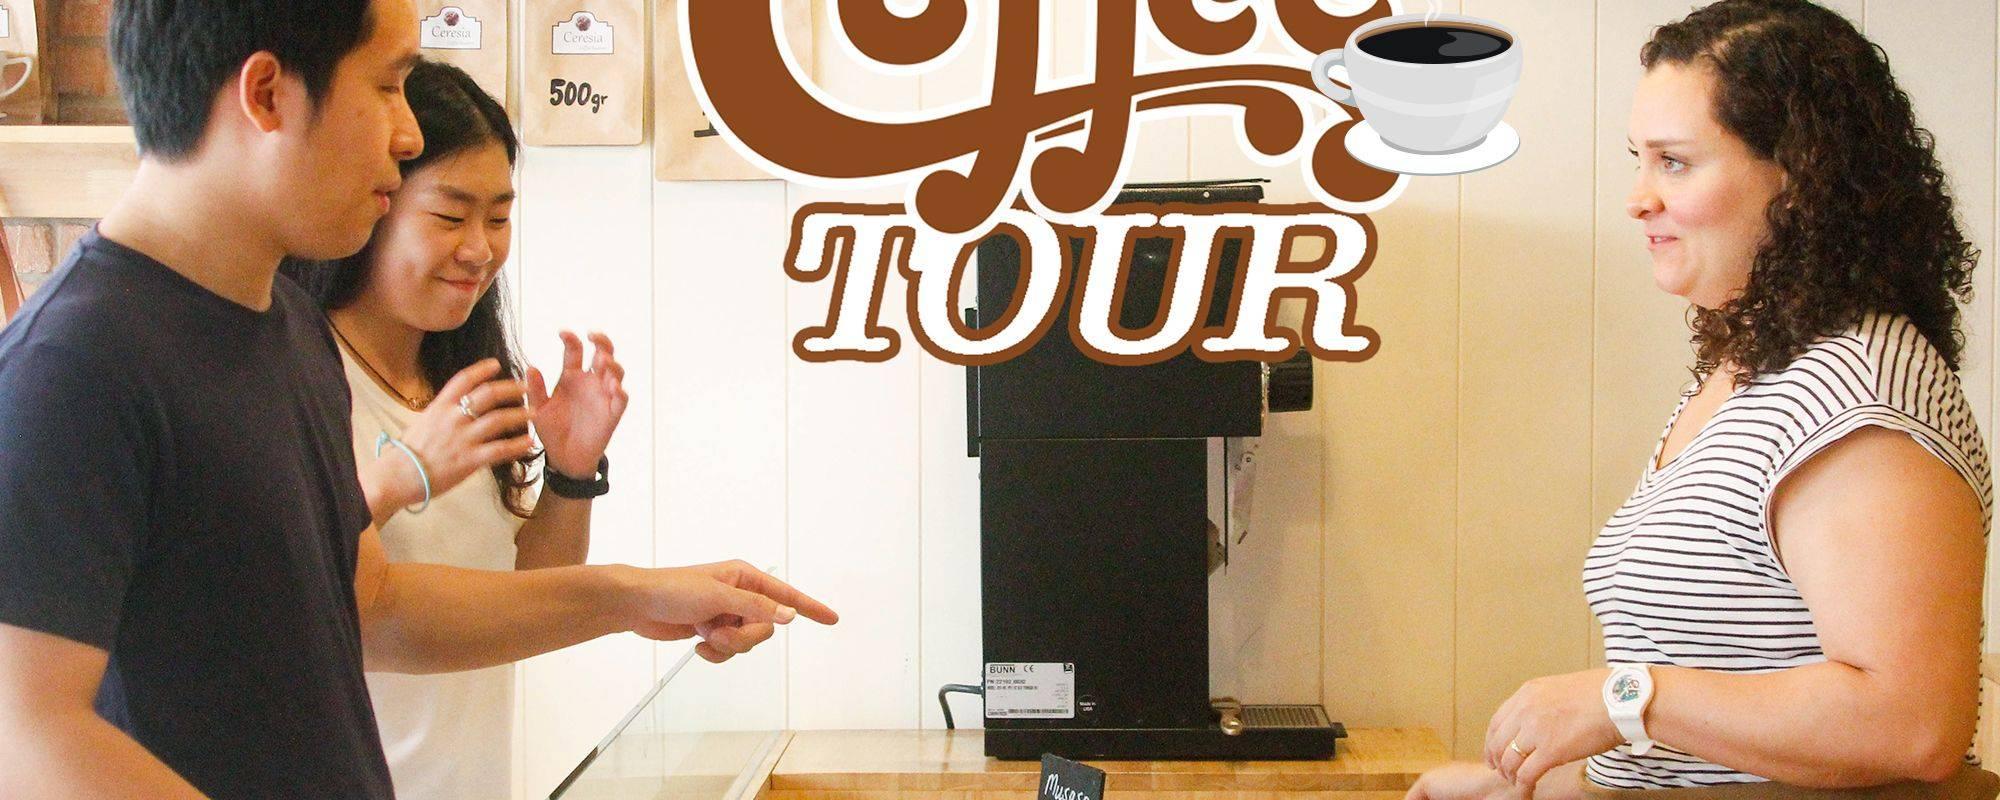 Cafe Hopping by A Cafe Hopper